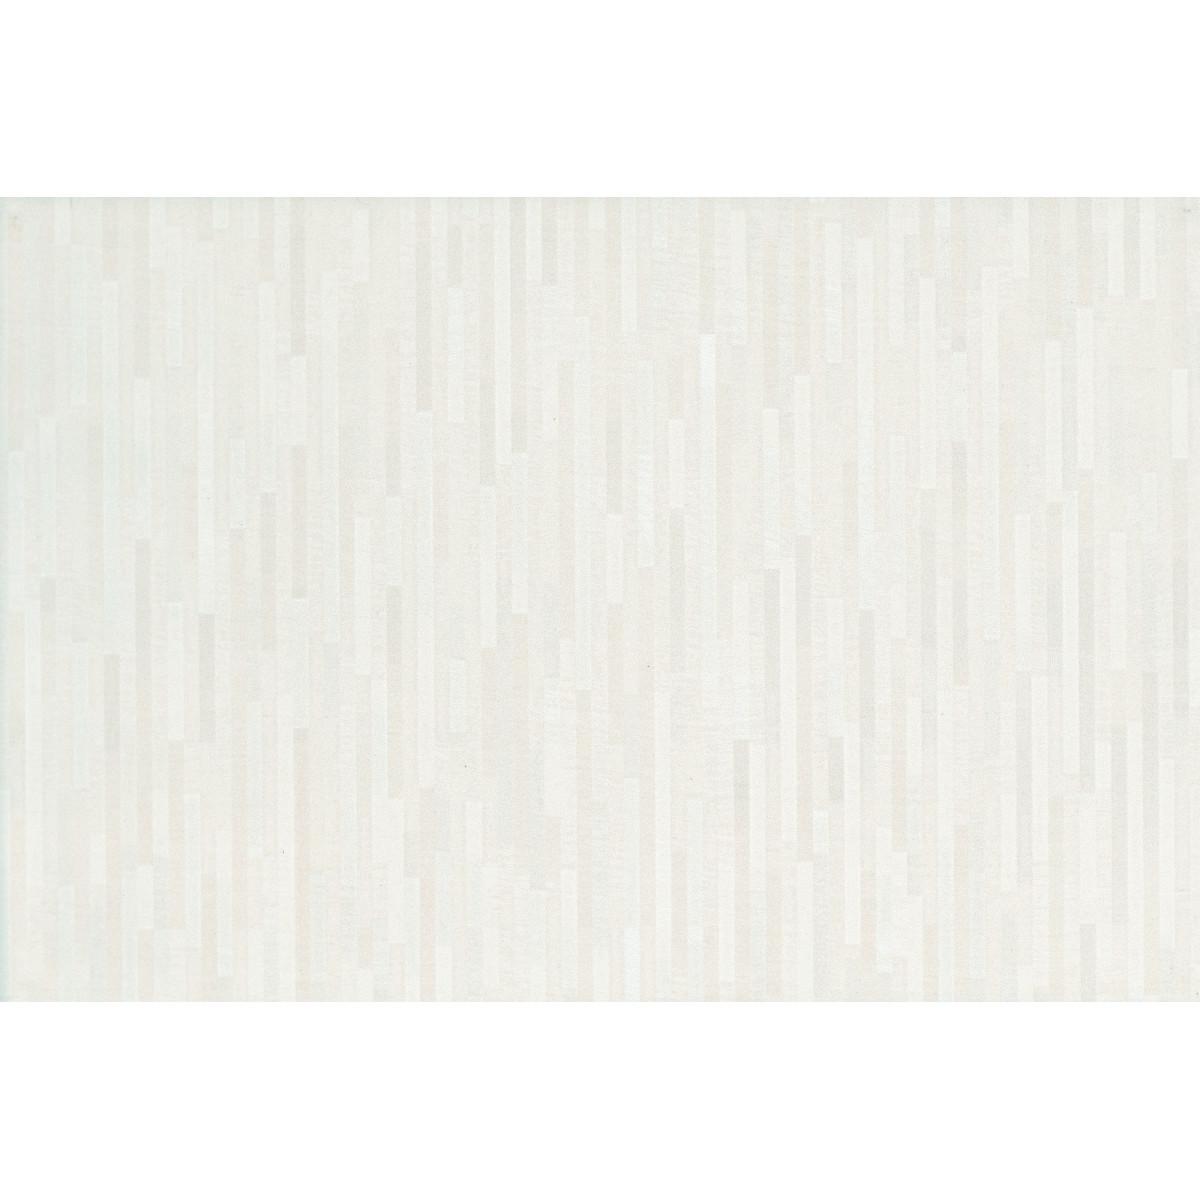 Плитка настенная Cersanit Olive 20x30 см 1.2 м2 цвет бежевый